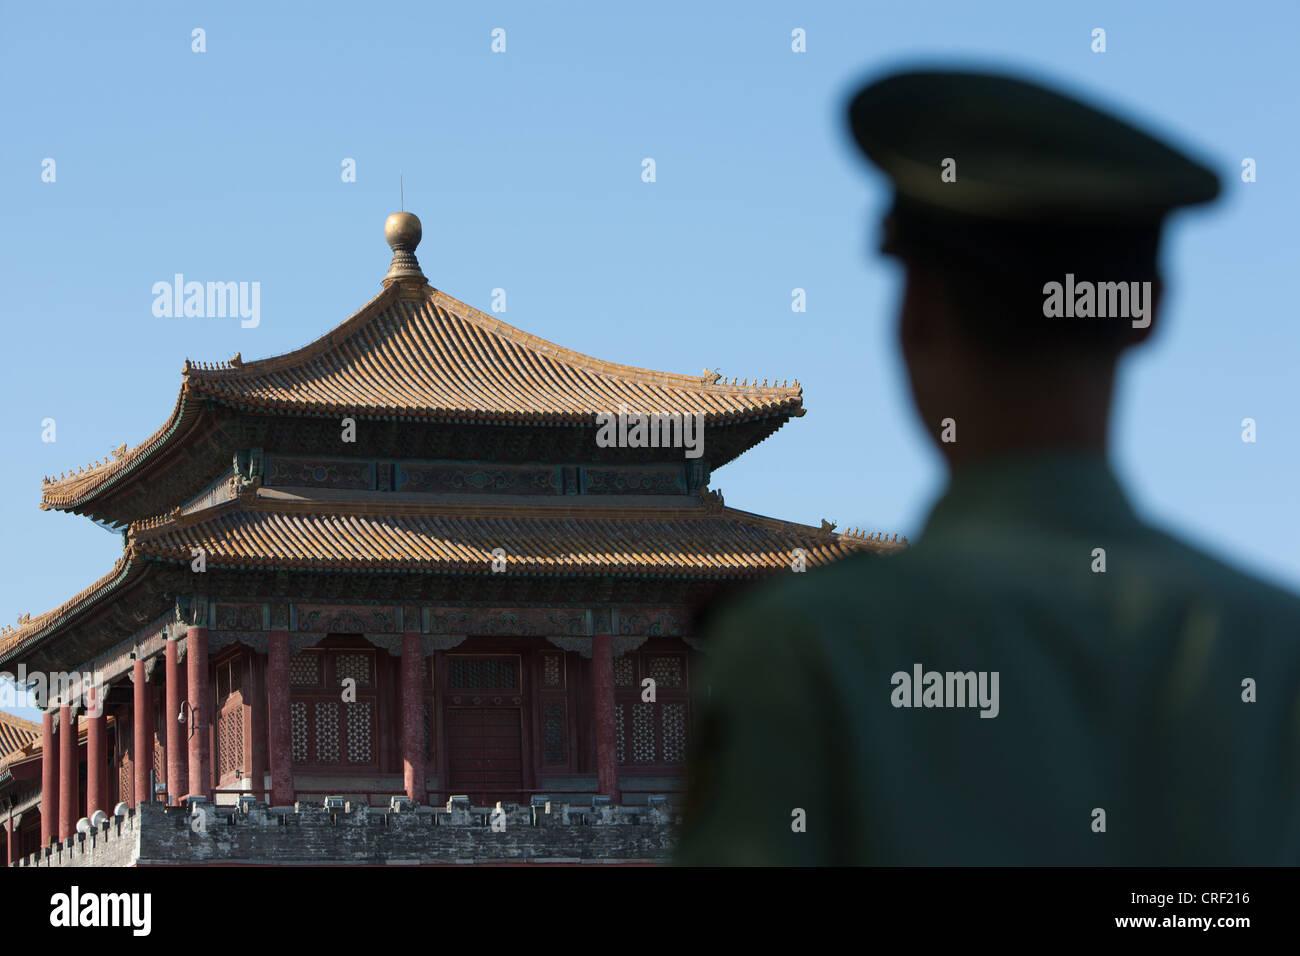 Die Verbotene Stadt in Peking, China Stockfoto